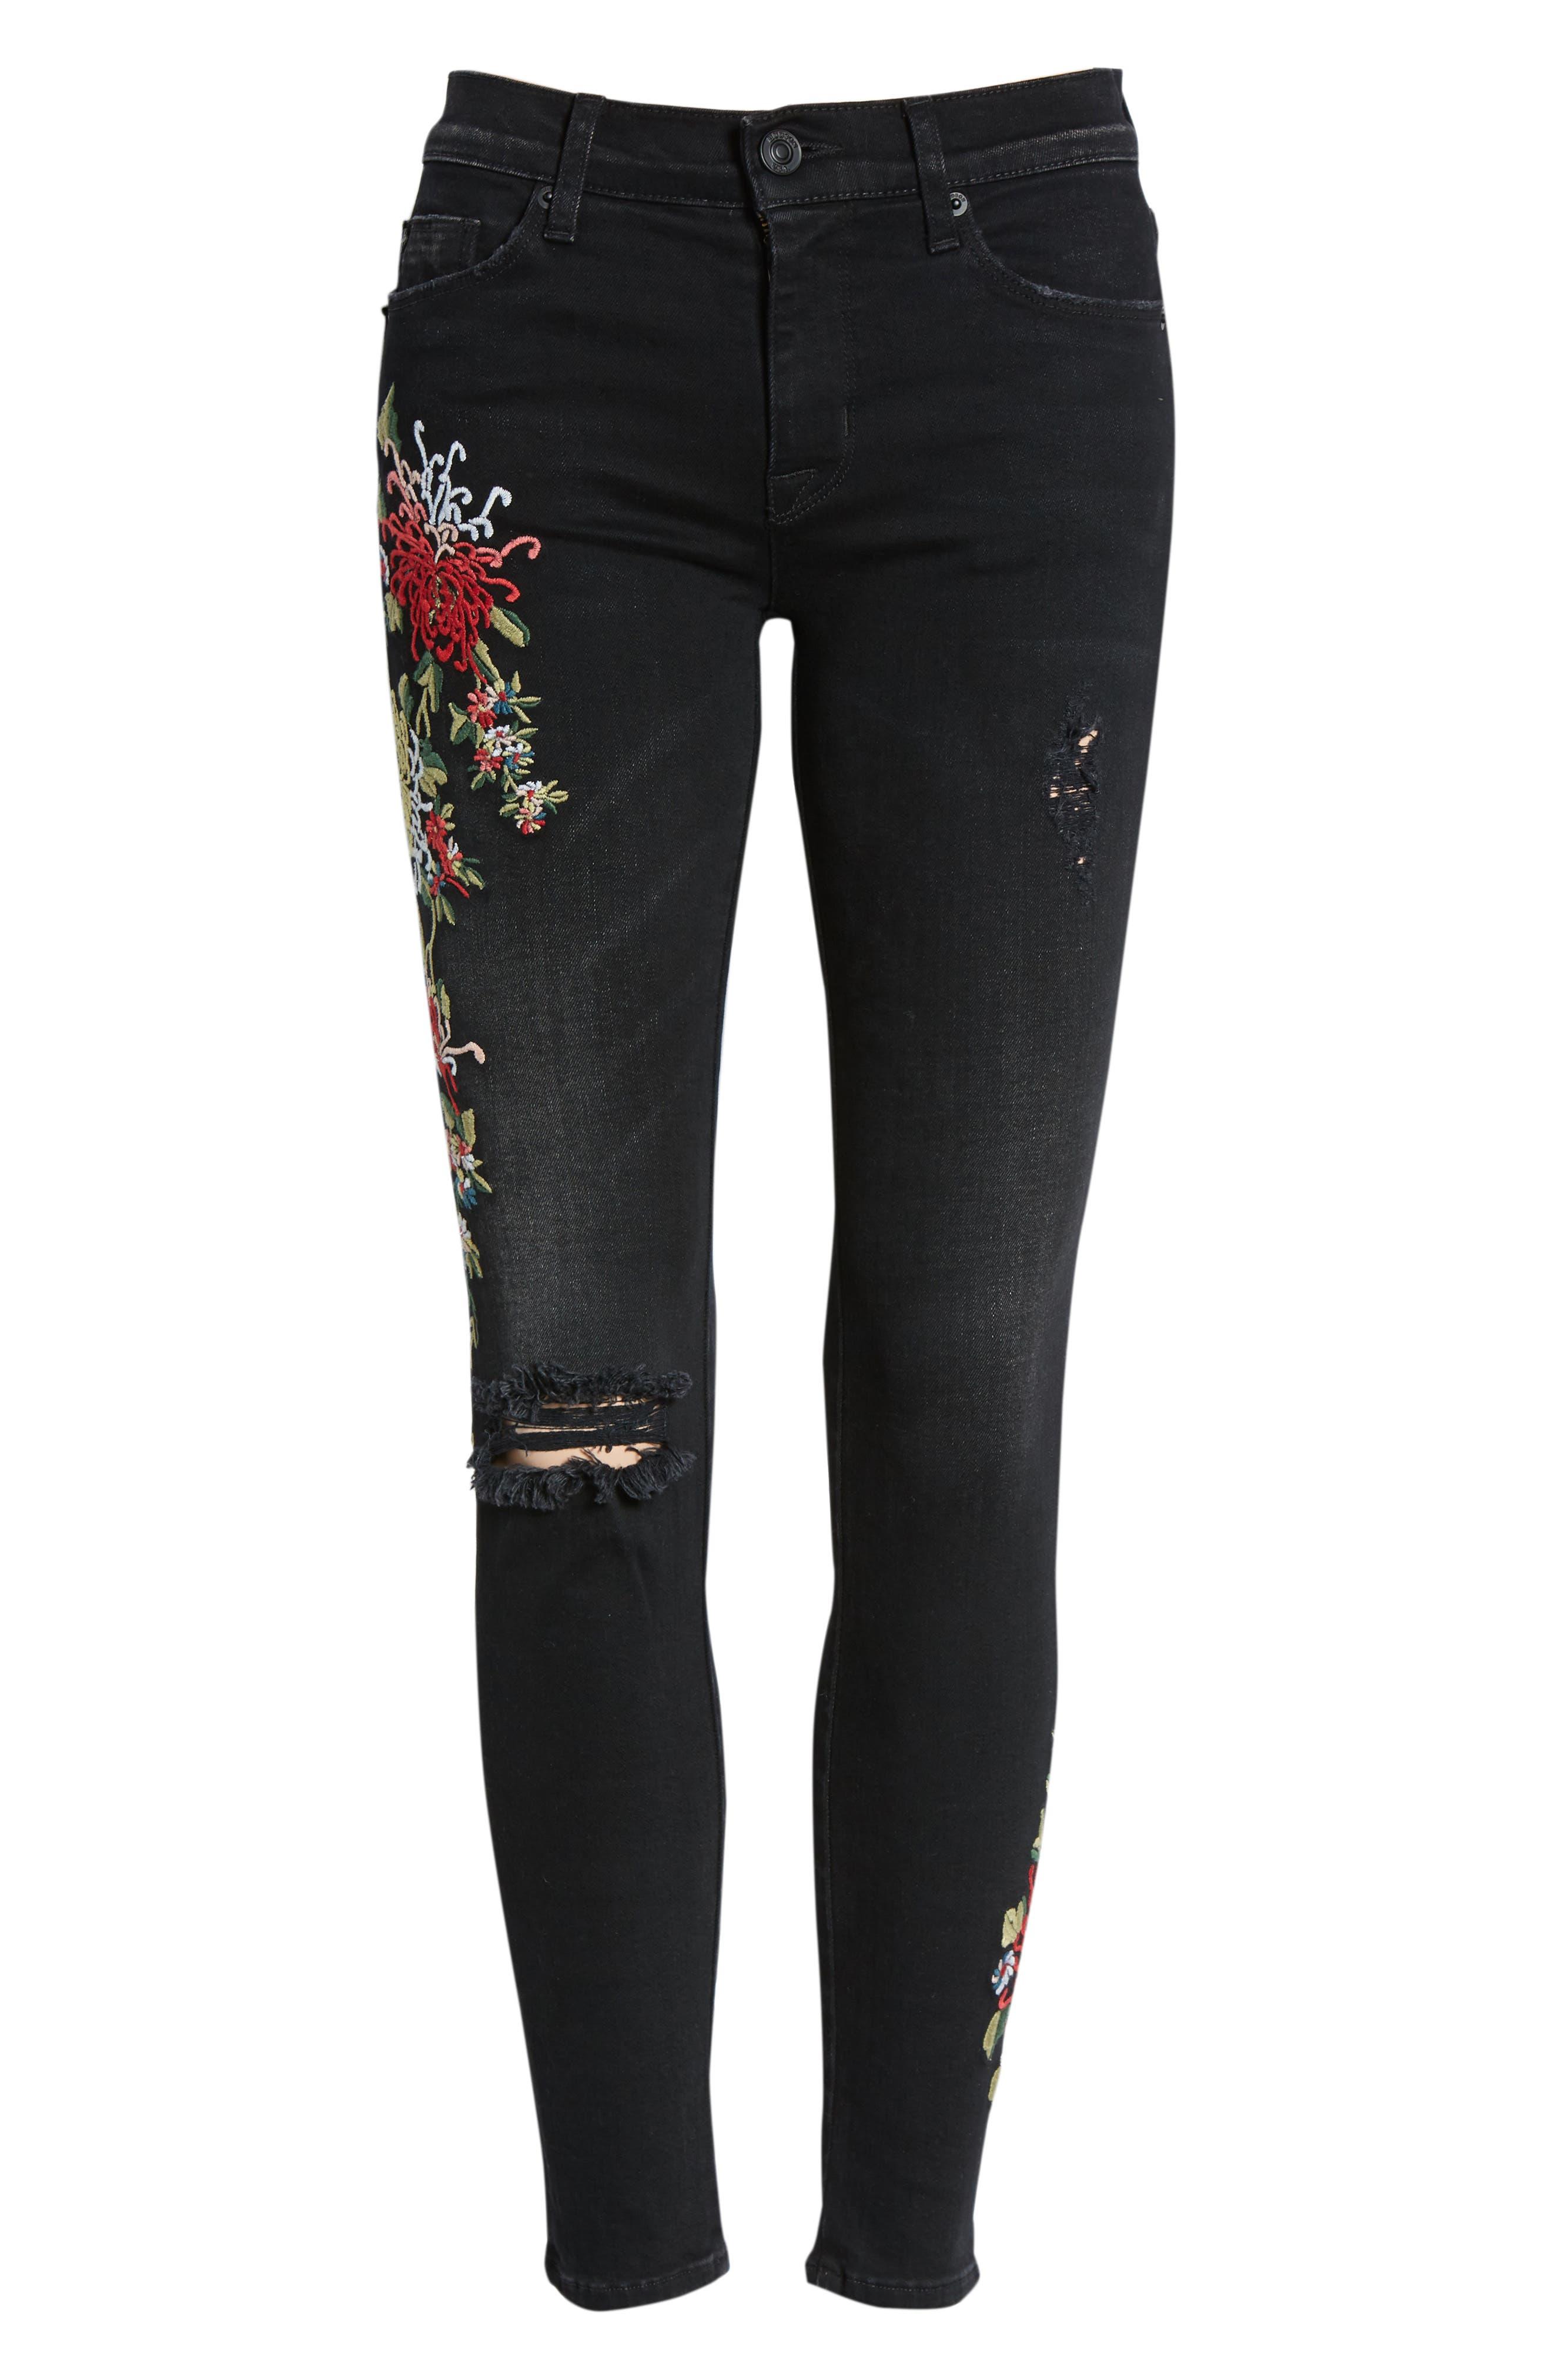 Nico Ankle Skinny Jeans,                             Alternate thumbnail 7, color,                             NOIR FLORET